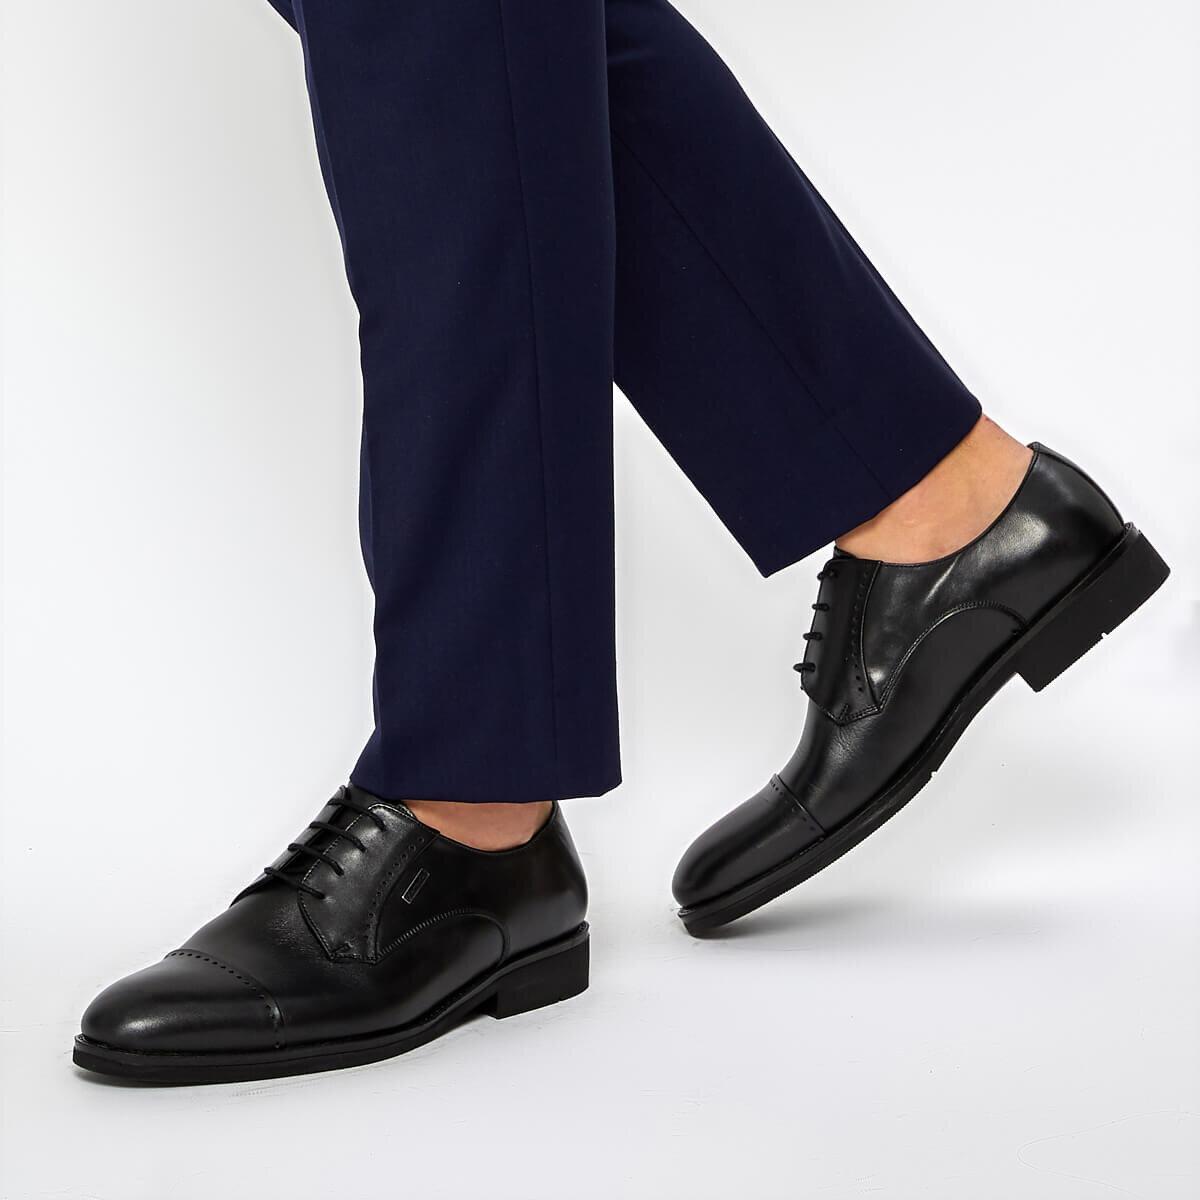 FLO NEBRASKA 9PR Black Men 'S Classic Shoes MERCEDES